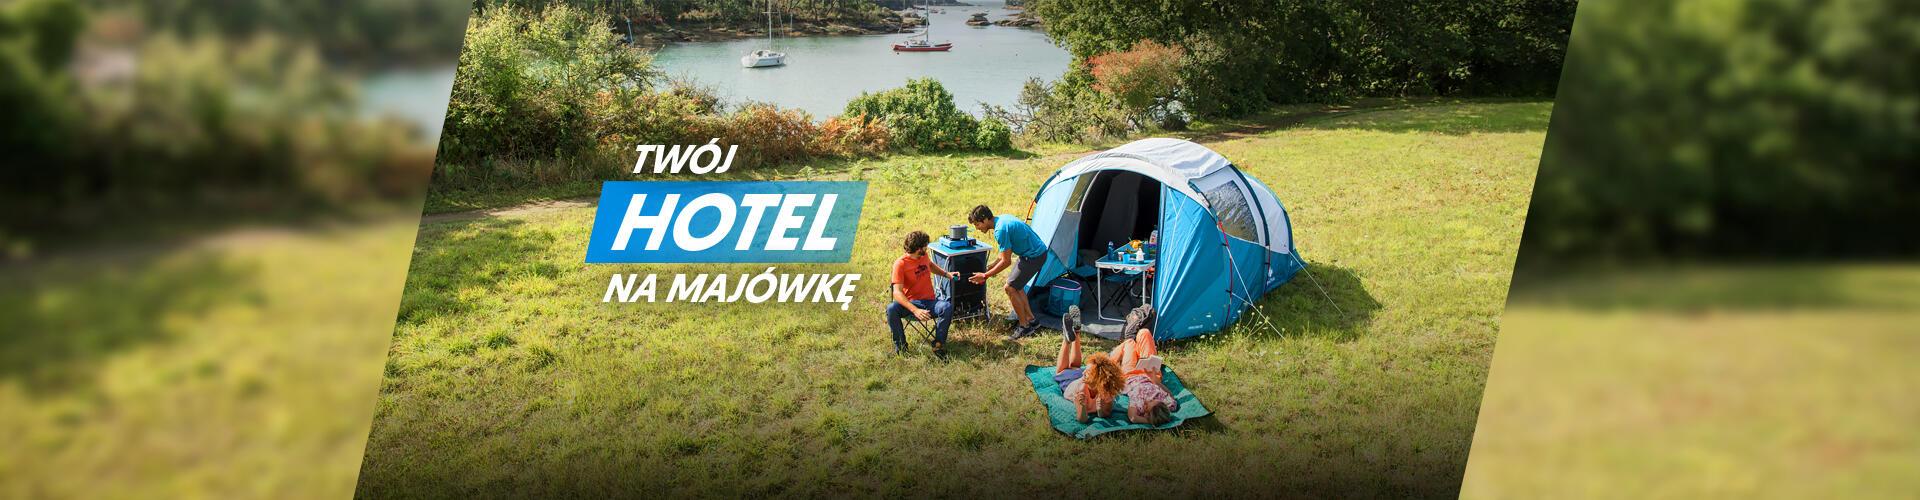 Hotel na majówkę - kemping, namioty, meble, śpiwory